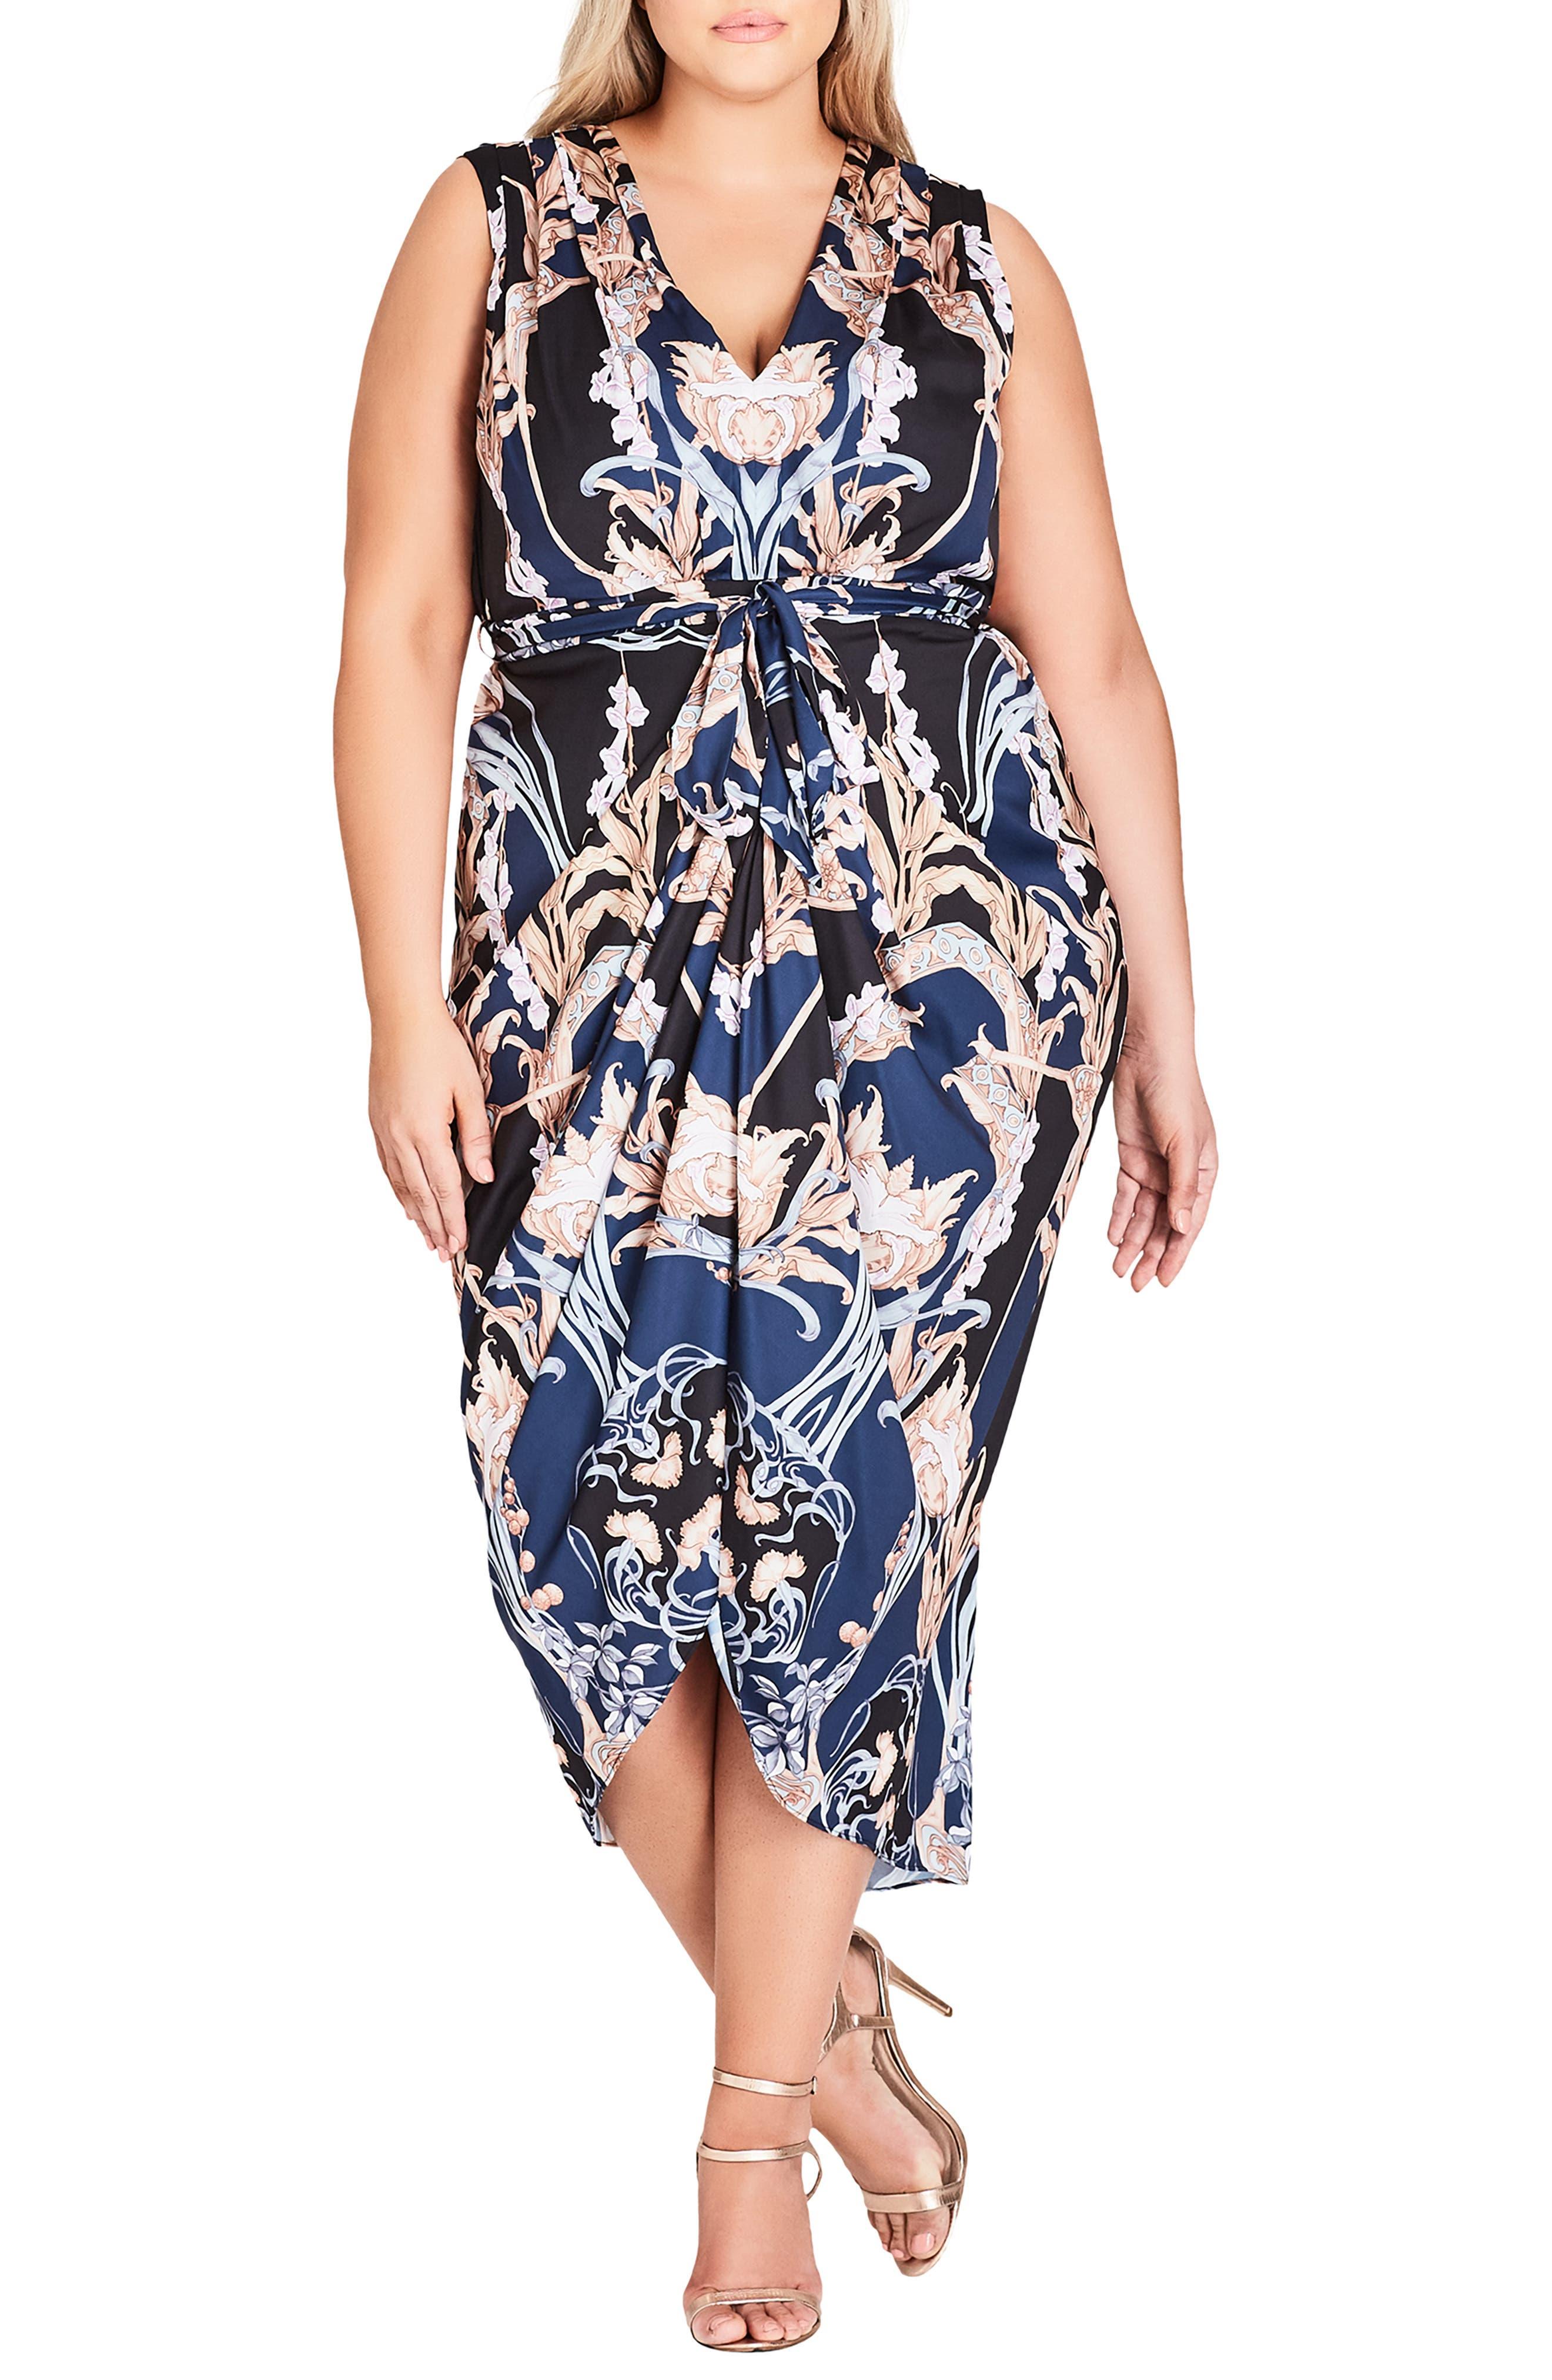 Plus Size City Chic Deco Print Sleeveless Dress, Black